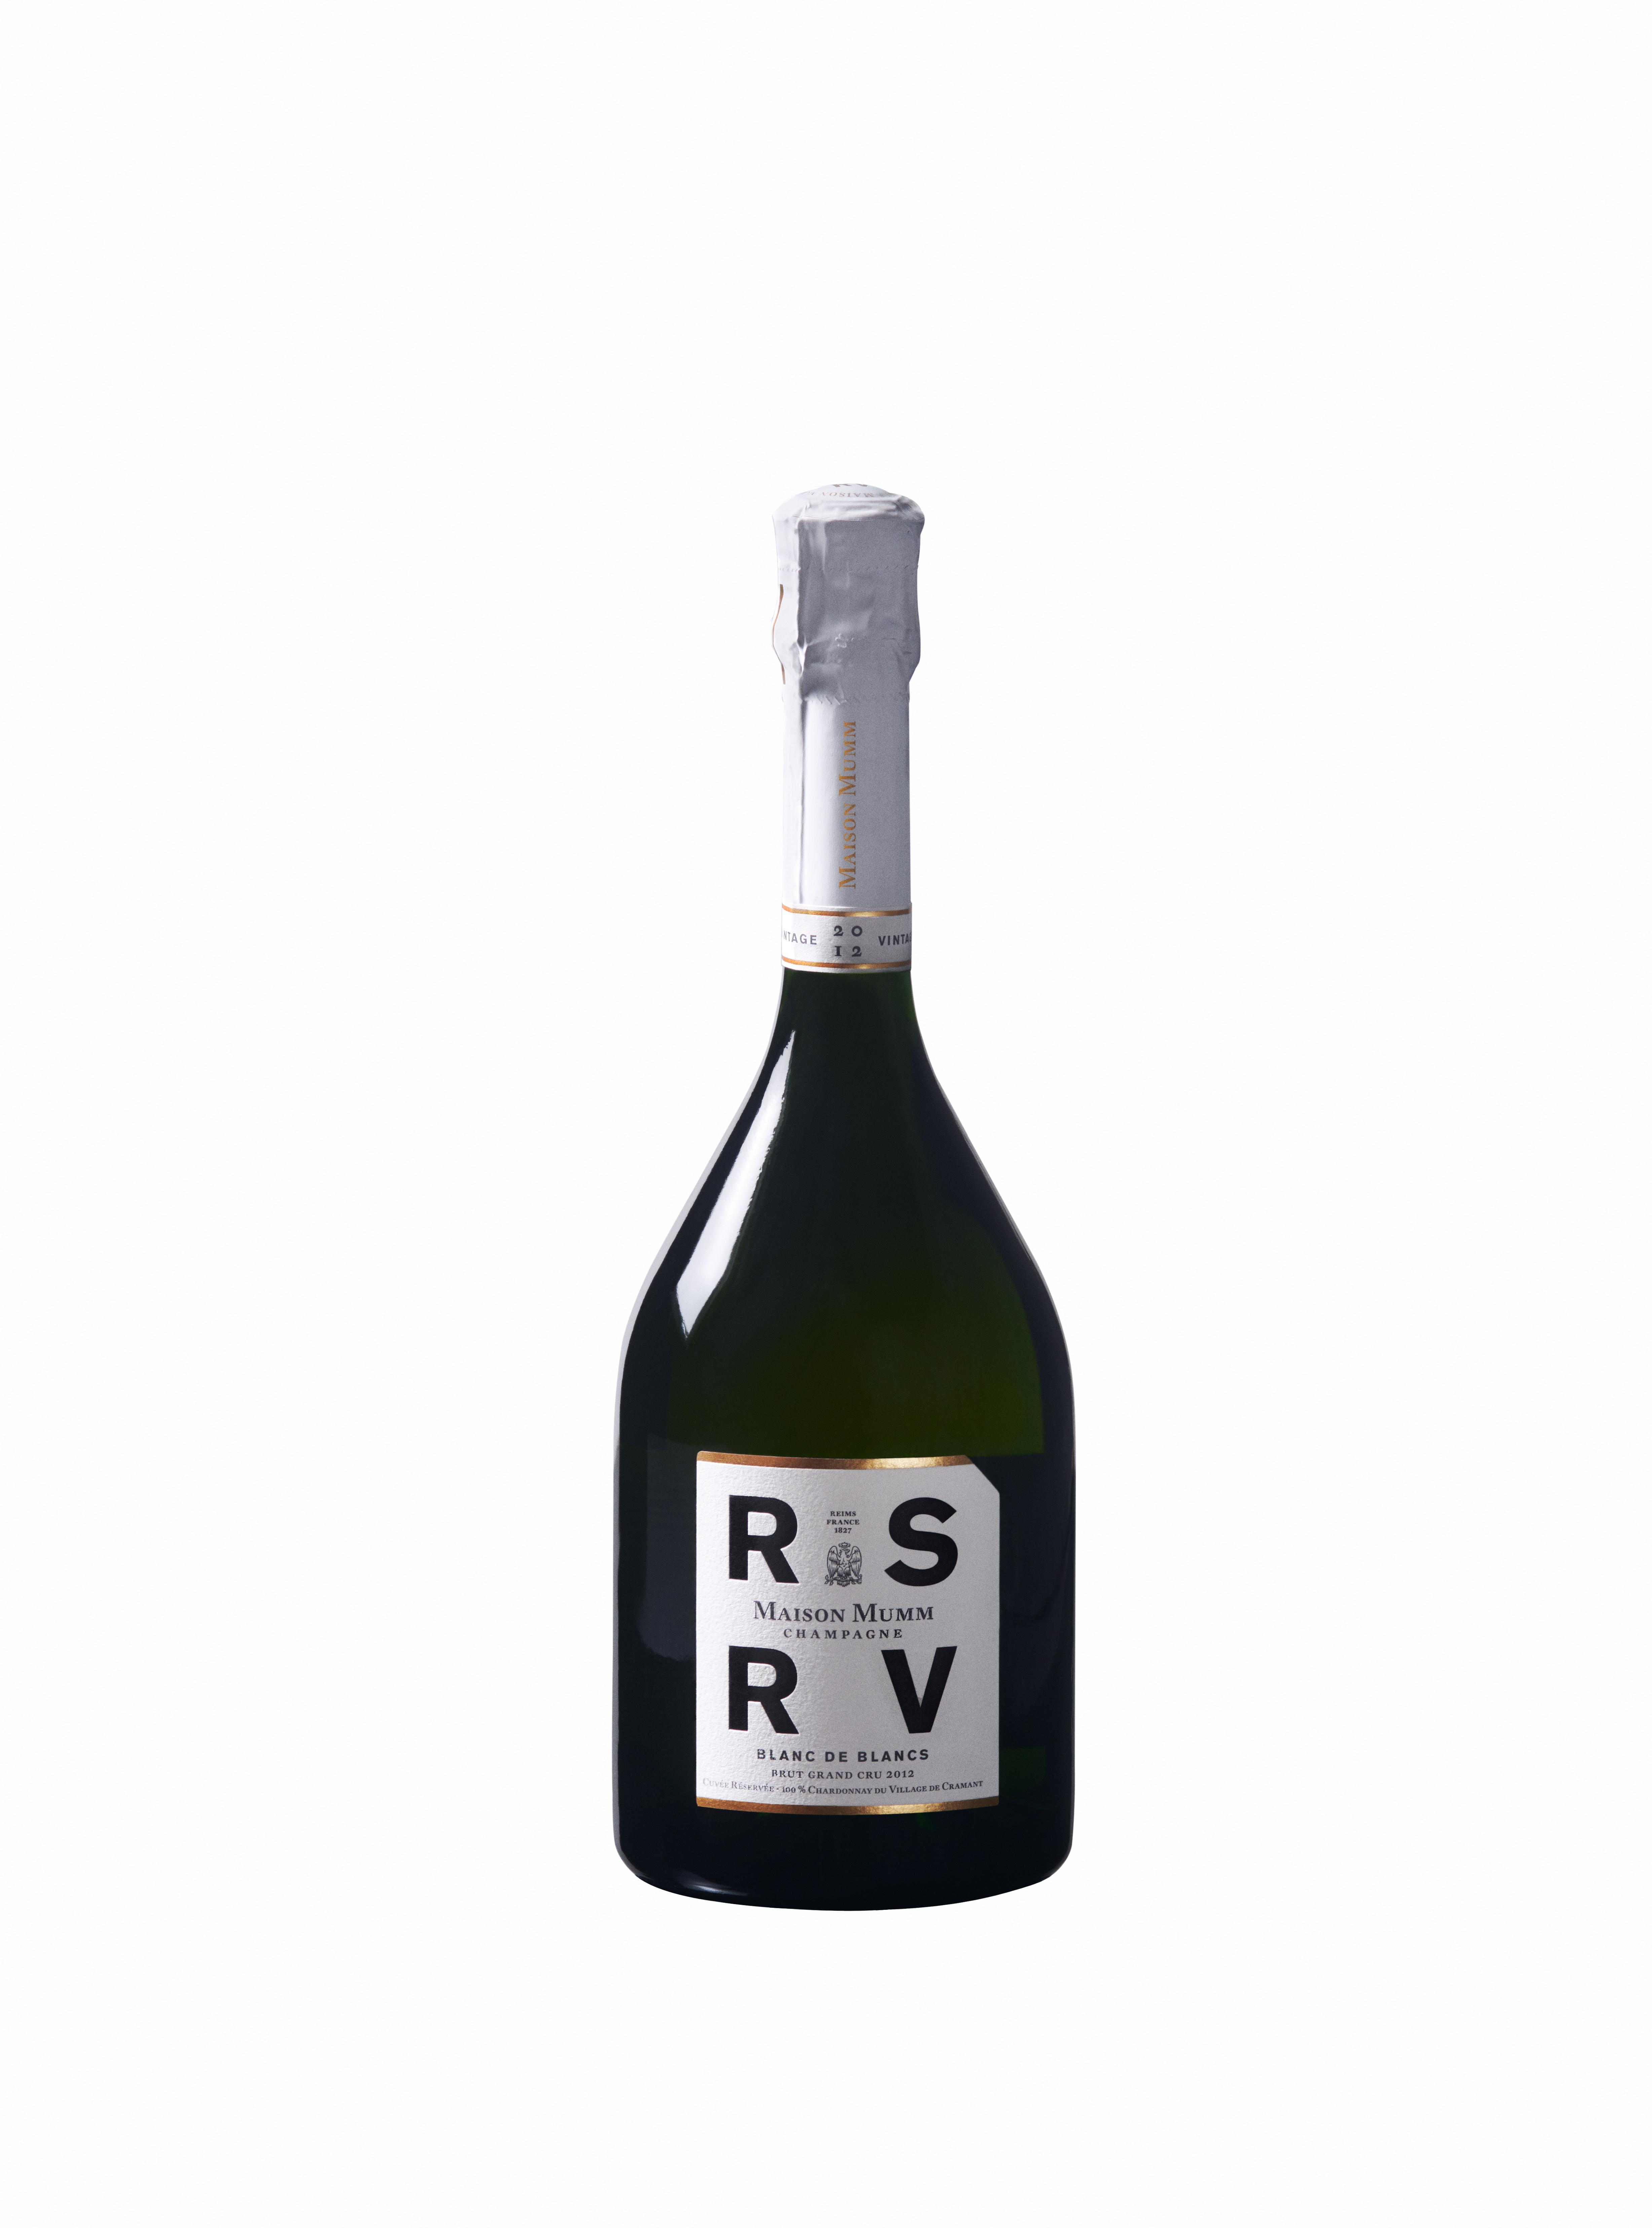 Mumm RSRV Blanc de Blancs